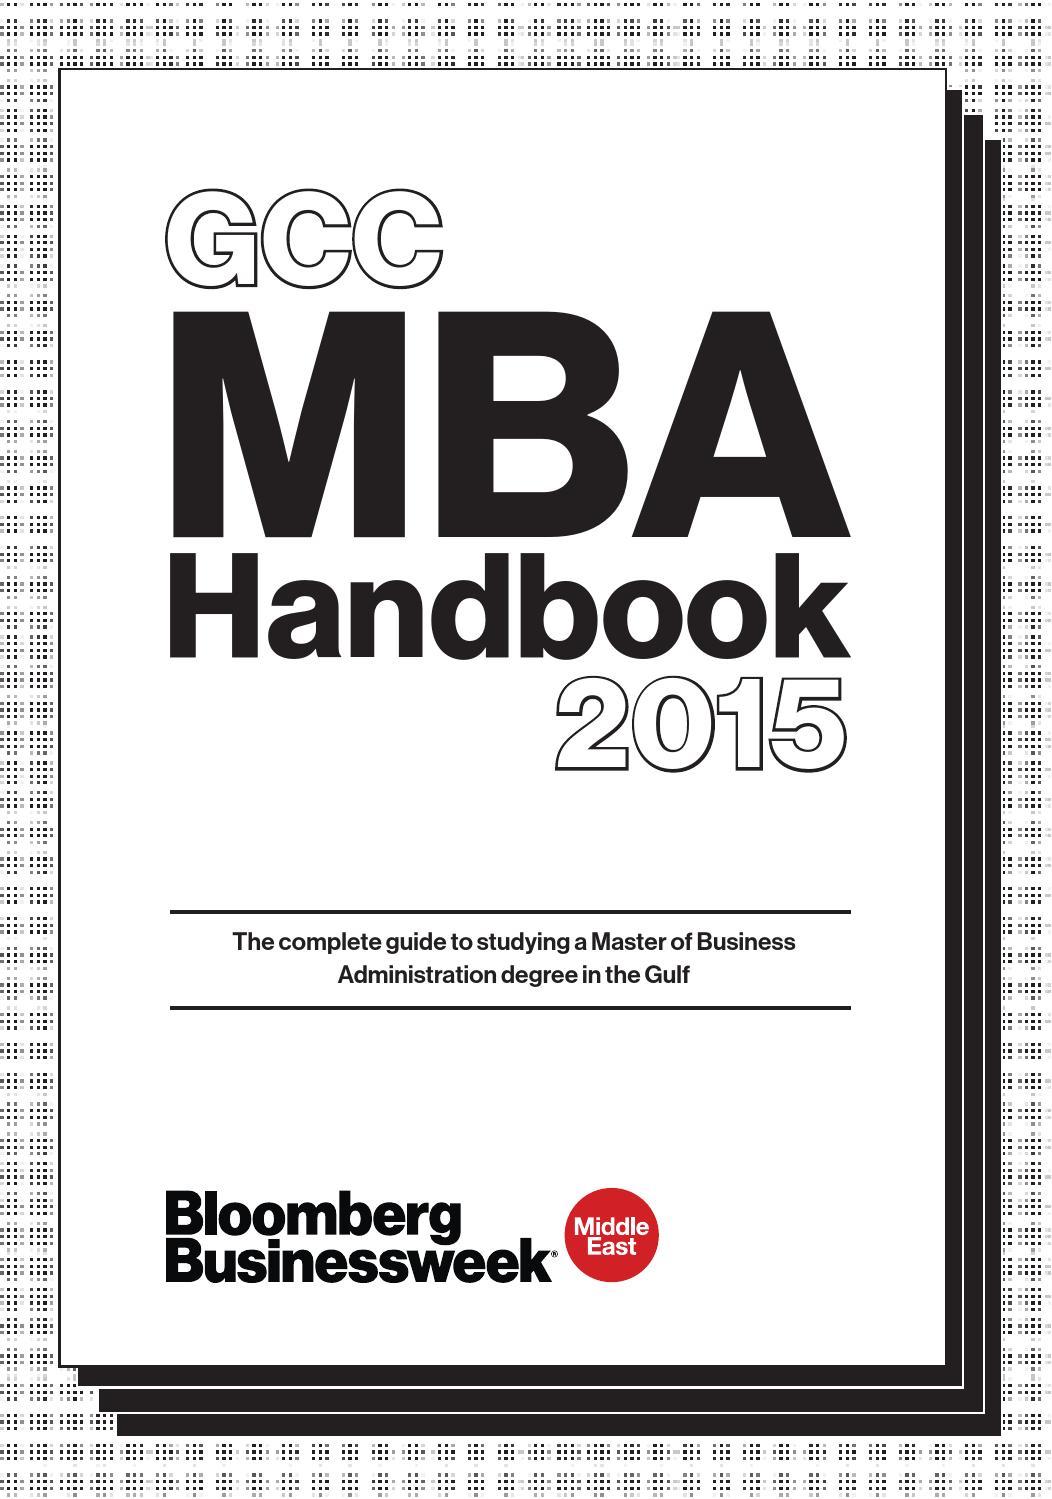 mba handbook